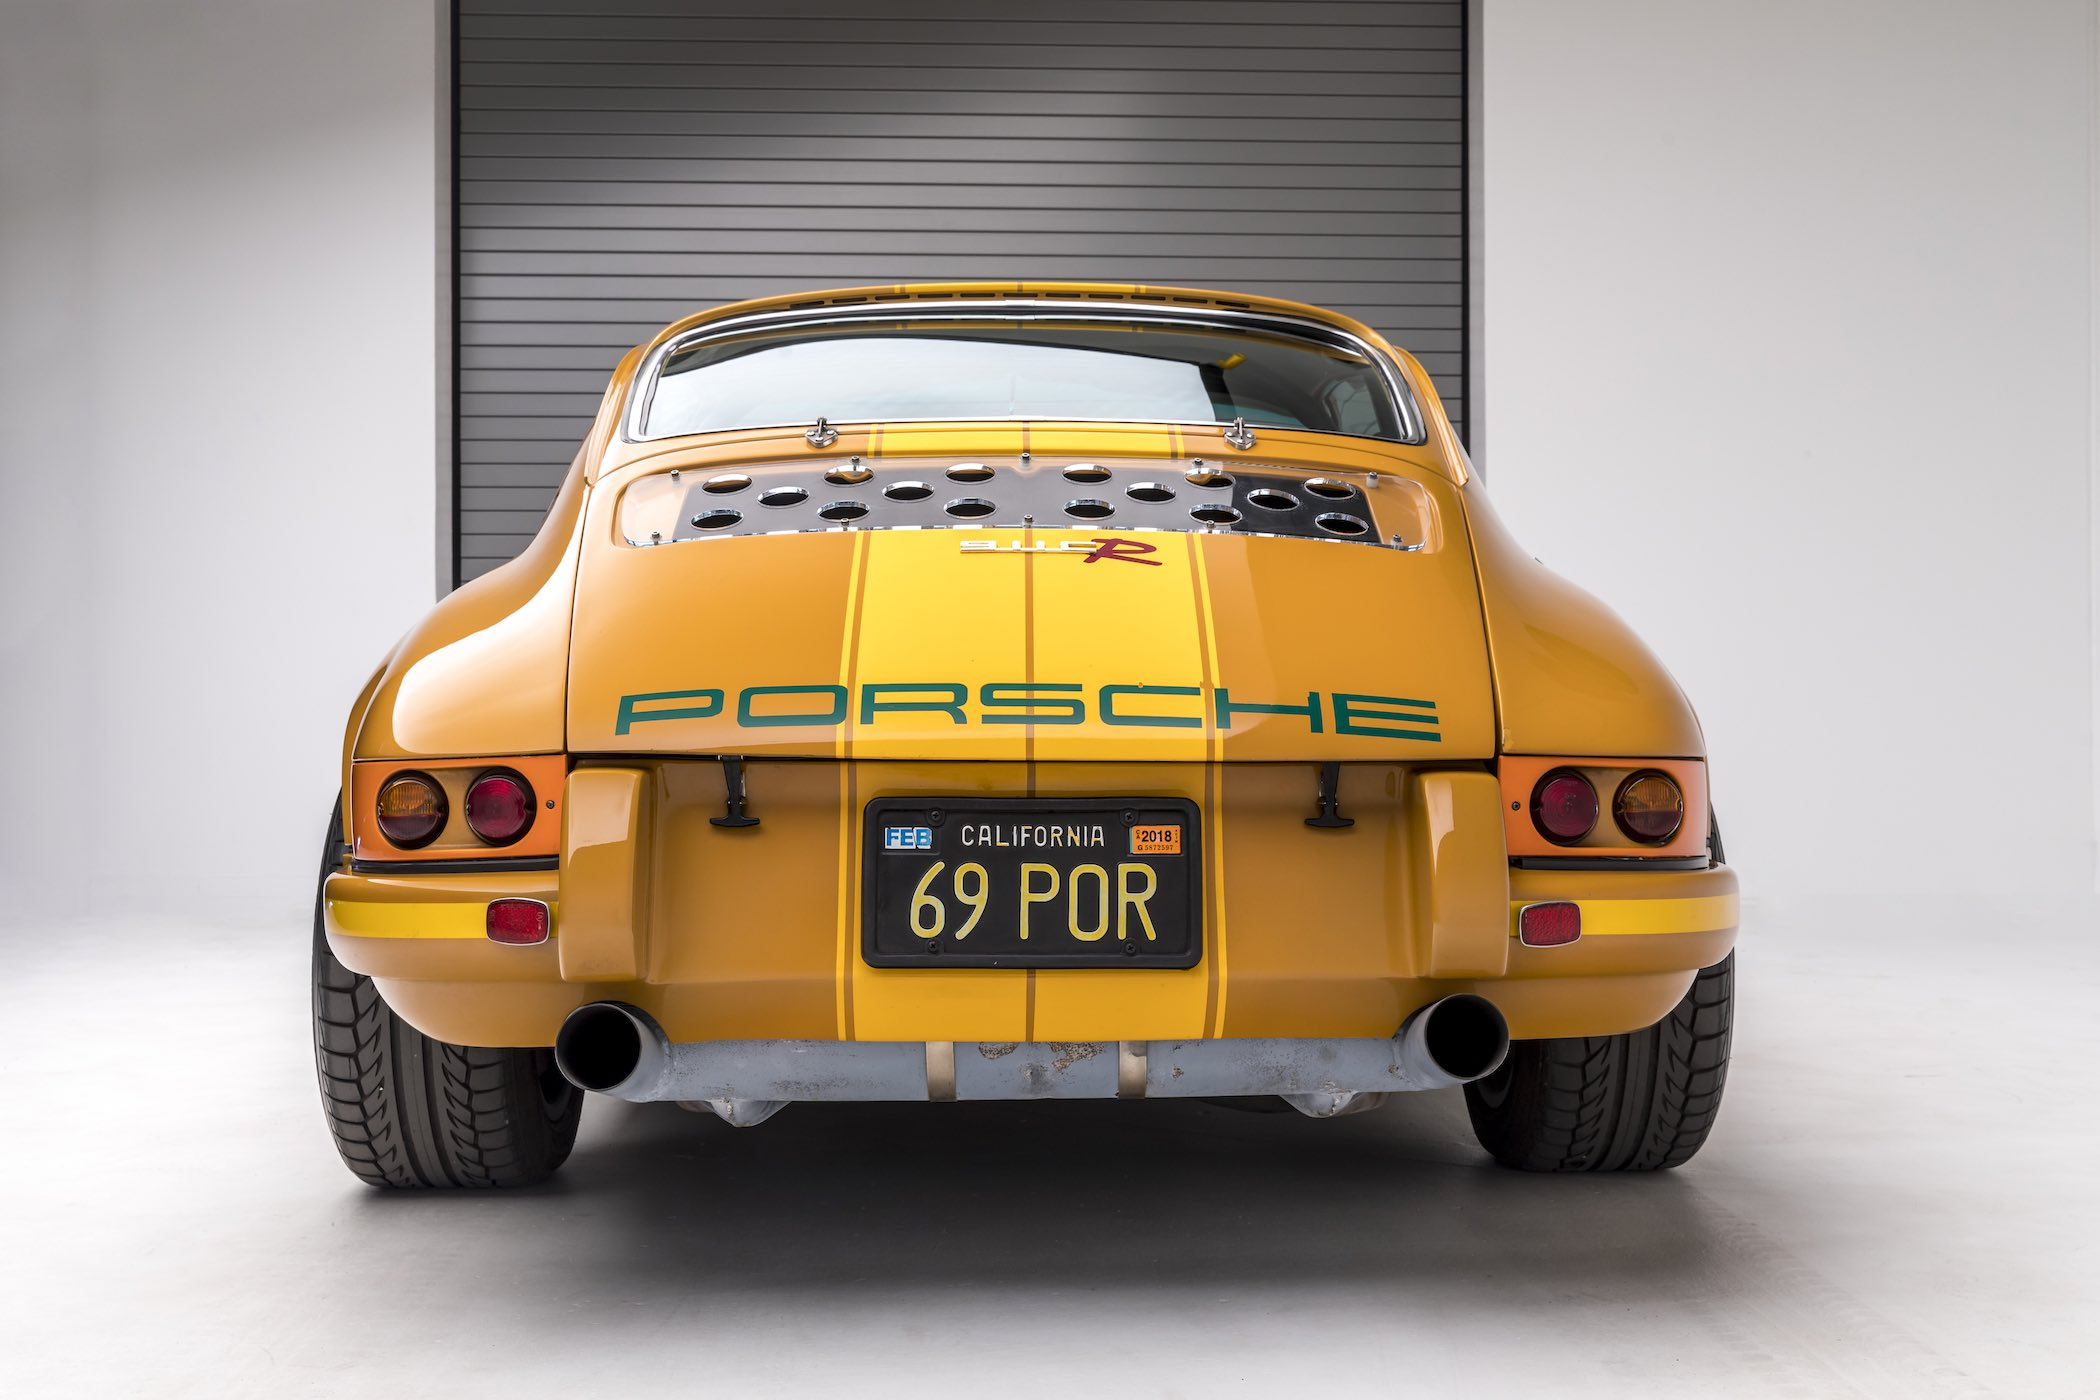 Rob Dickinson Singer Vehicle Design - 1969 911E first car